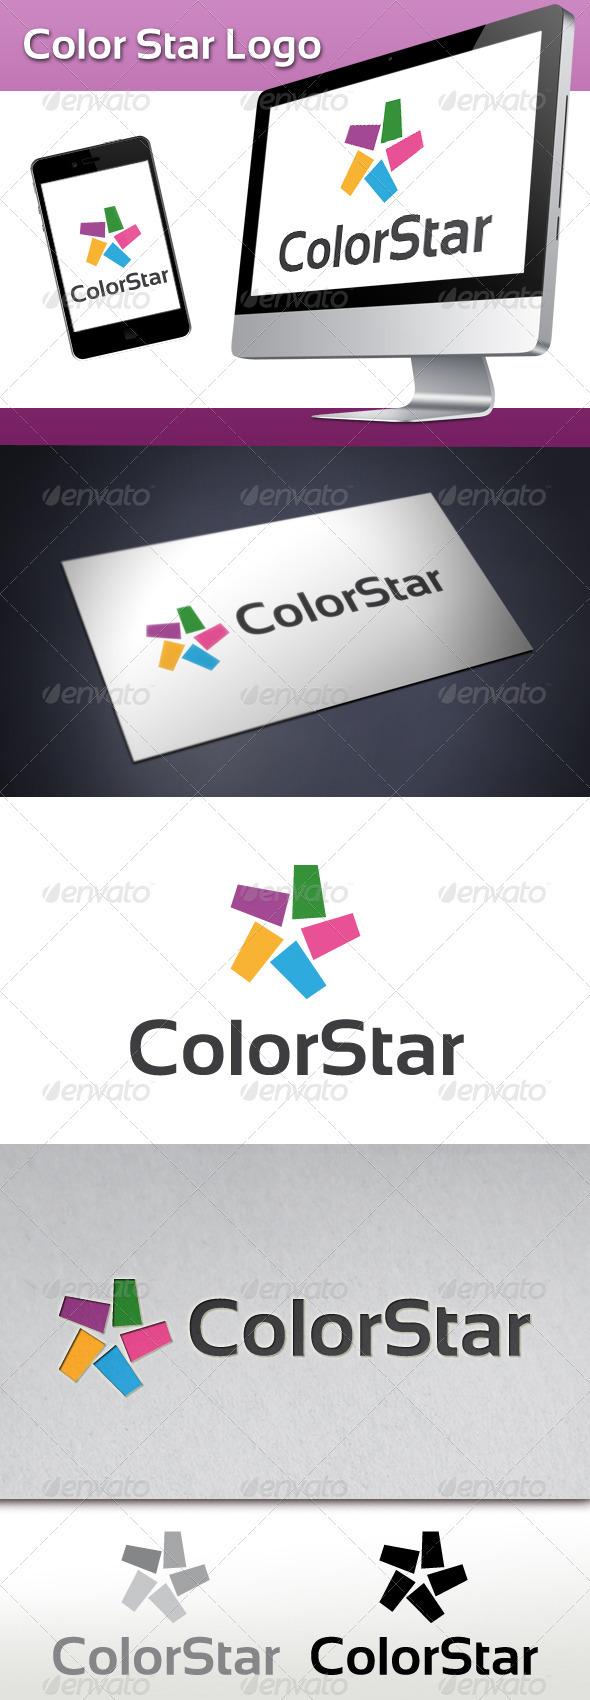 GraphicRiver Color Star Logo 3546946